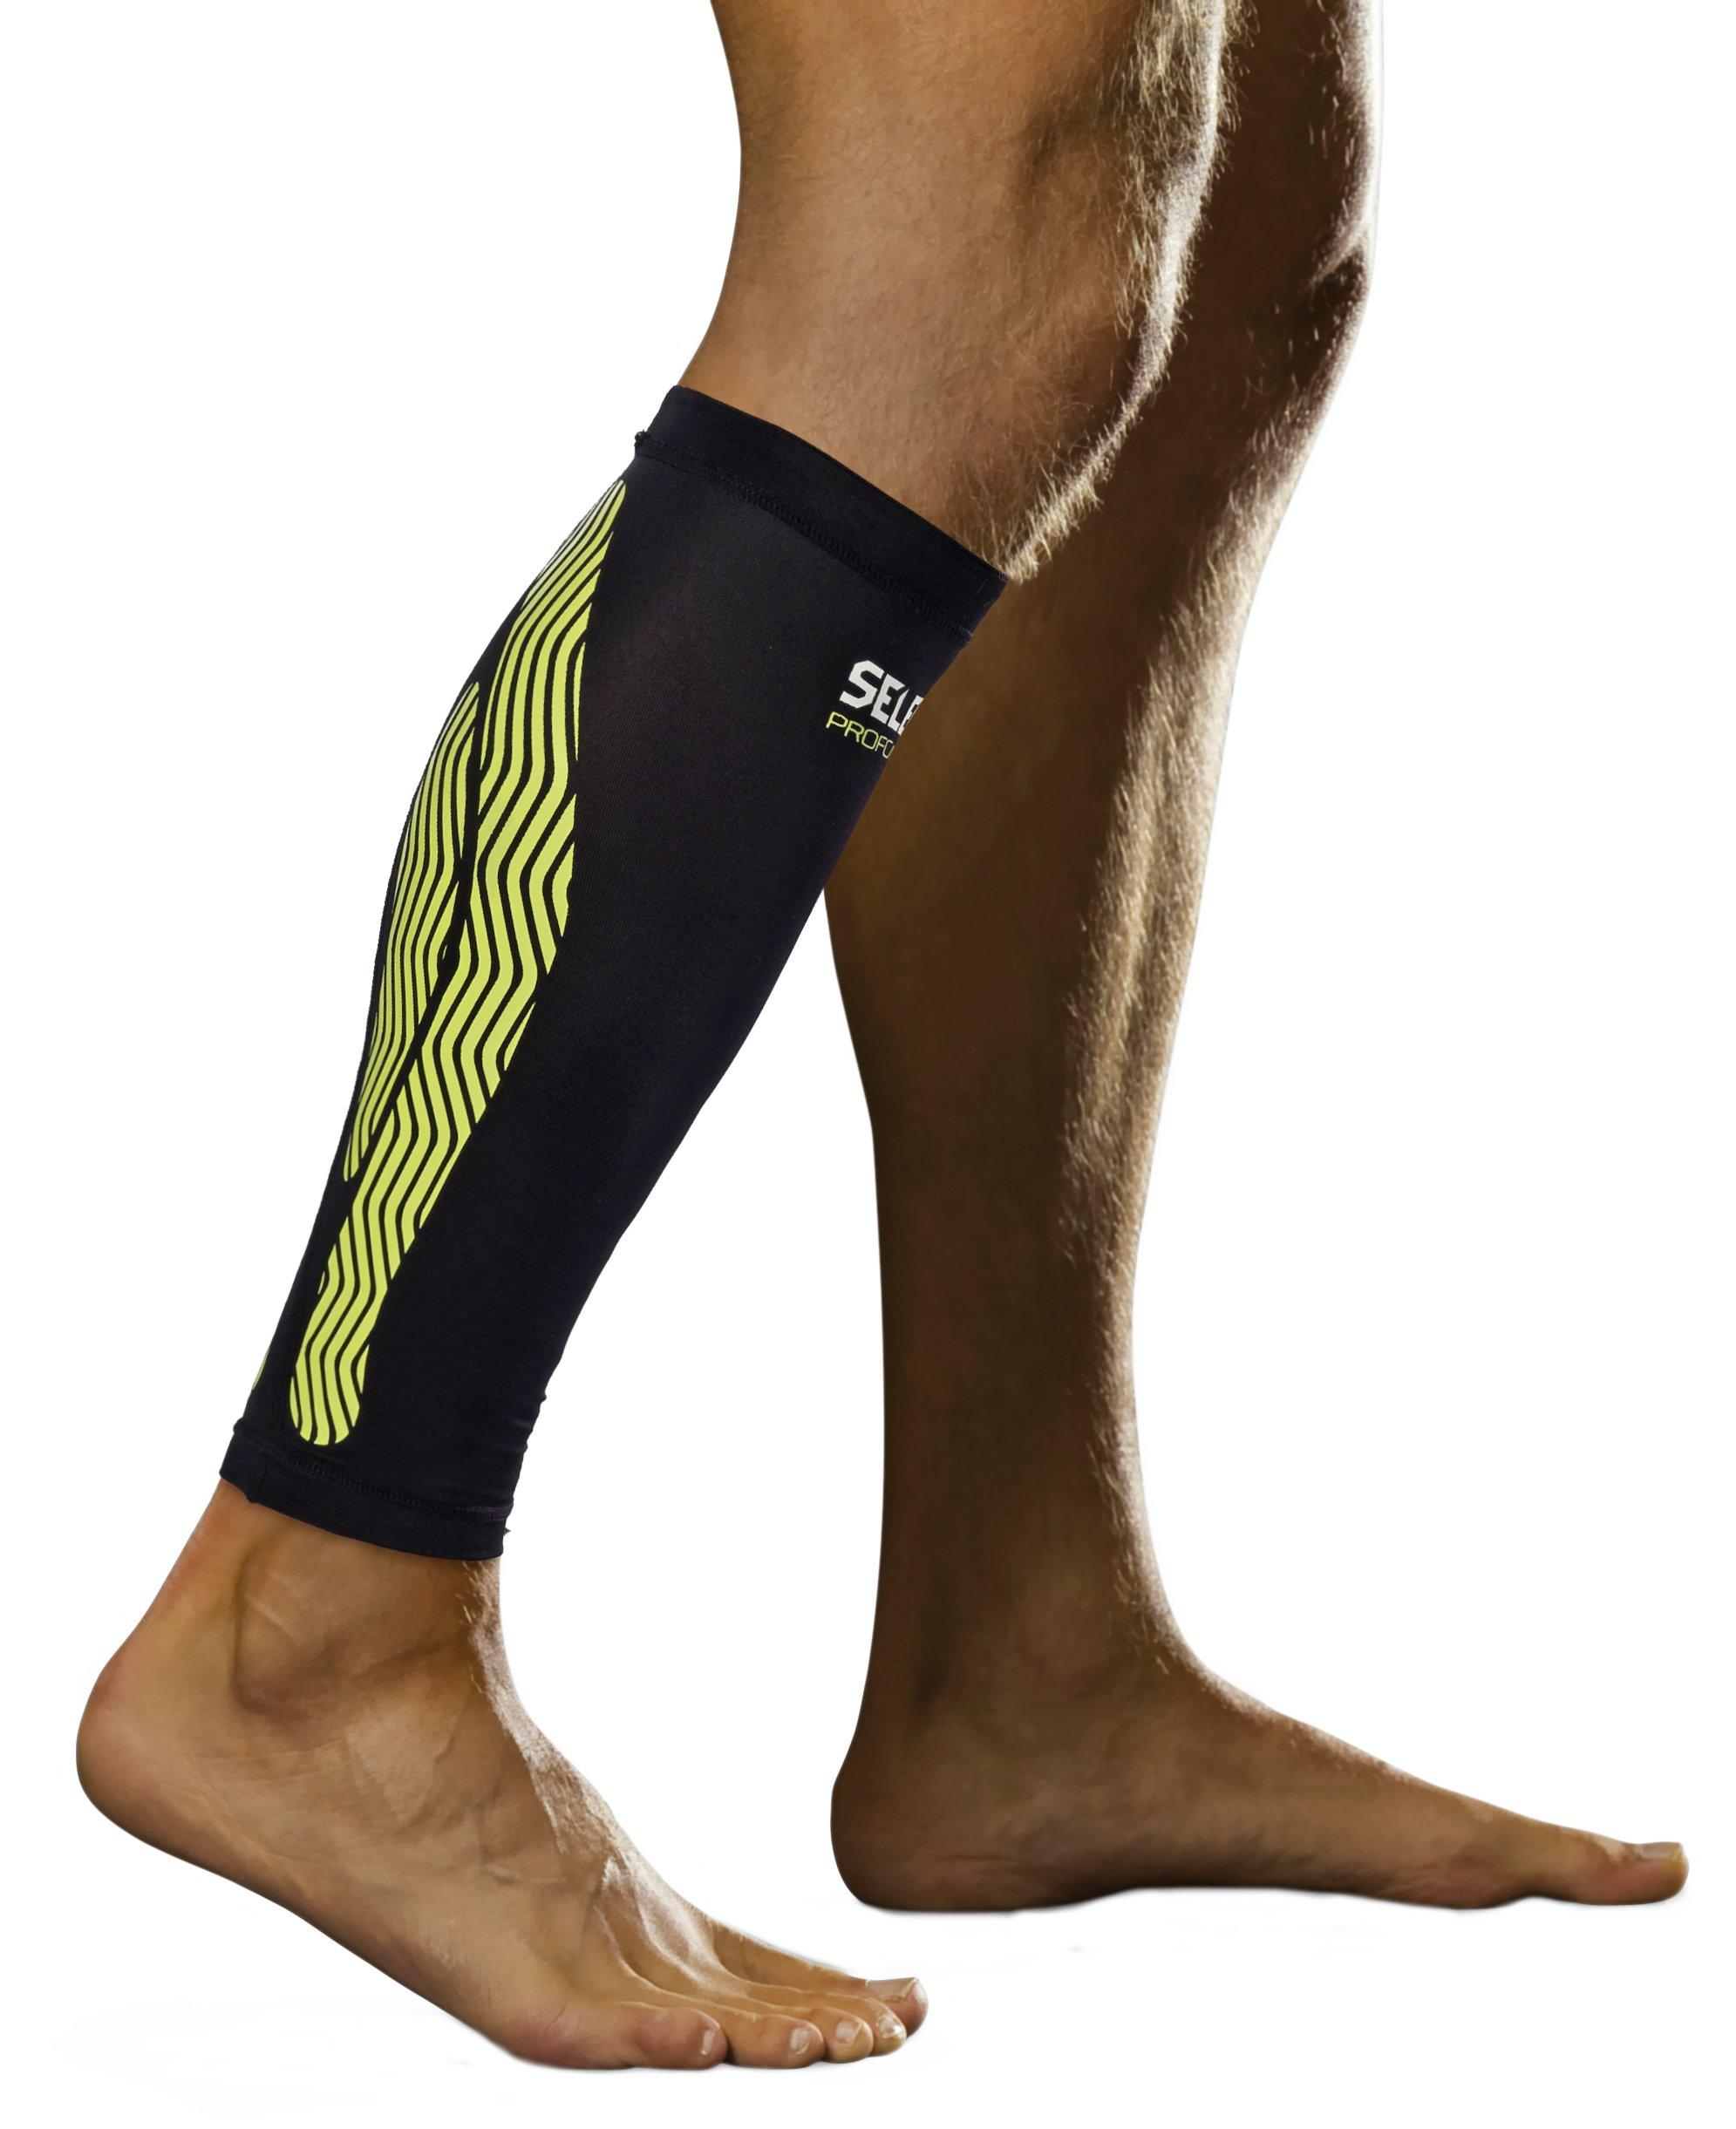 Vyberte Ponožky Compression Bands Calf 6150 L